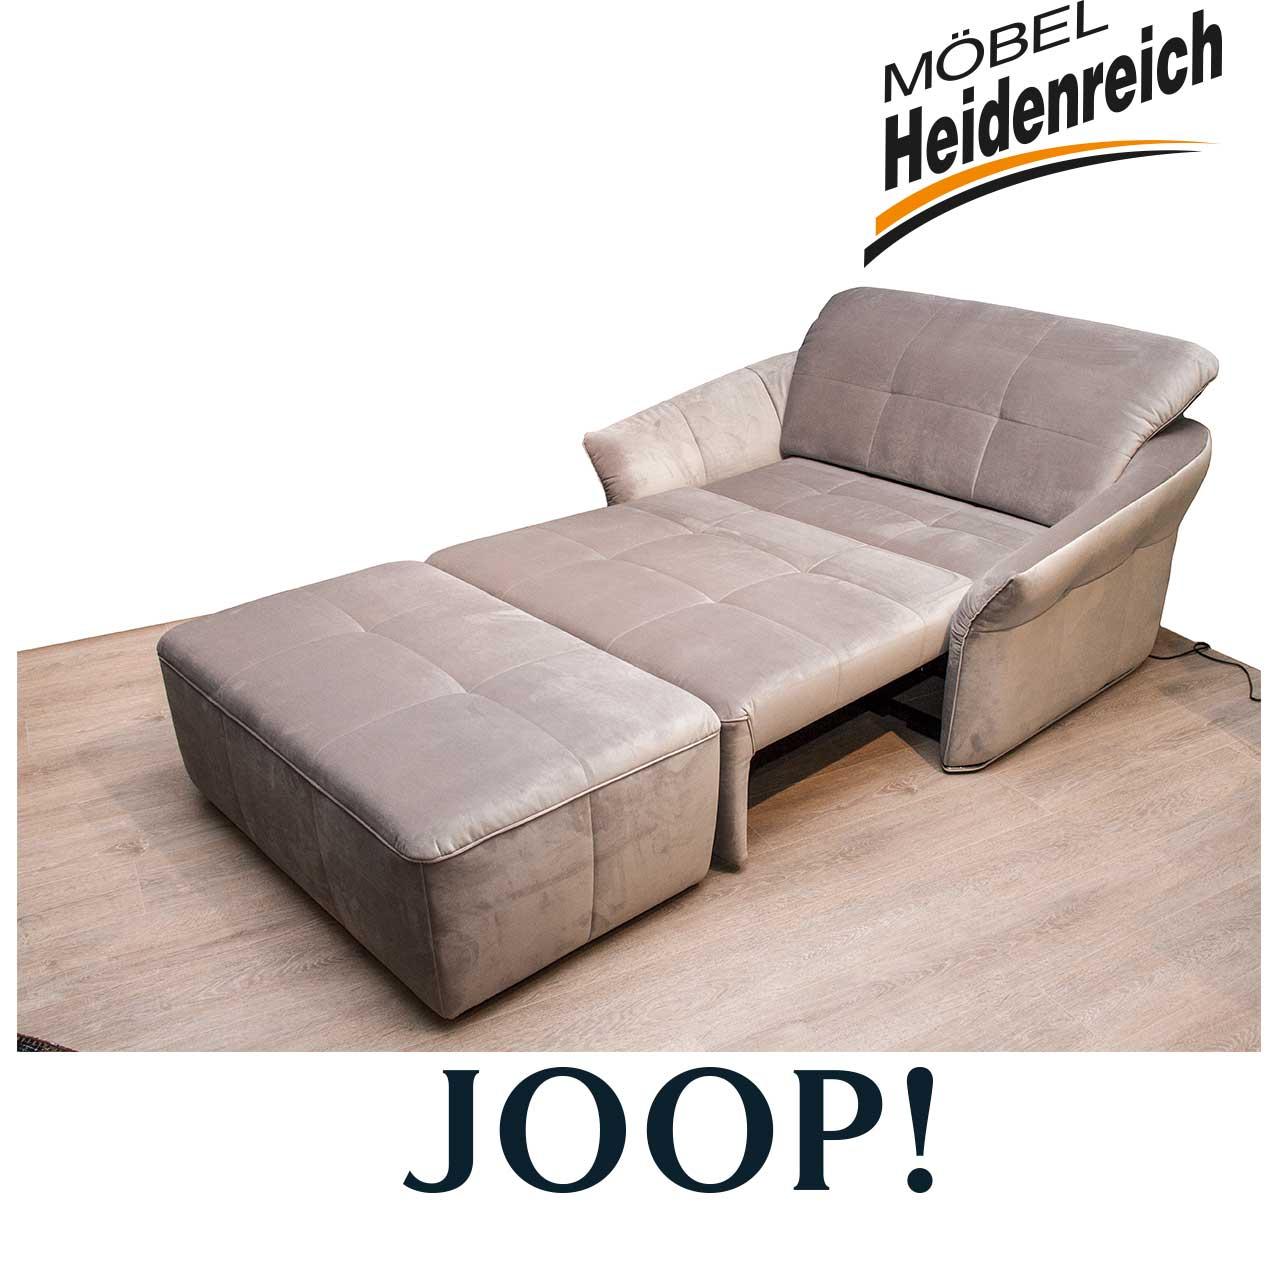 joop sessel overnight mit hocker motorisch grau sessel sale m bel heidenreich. Black Bedroom Furniture Sets. Home Design Ideas